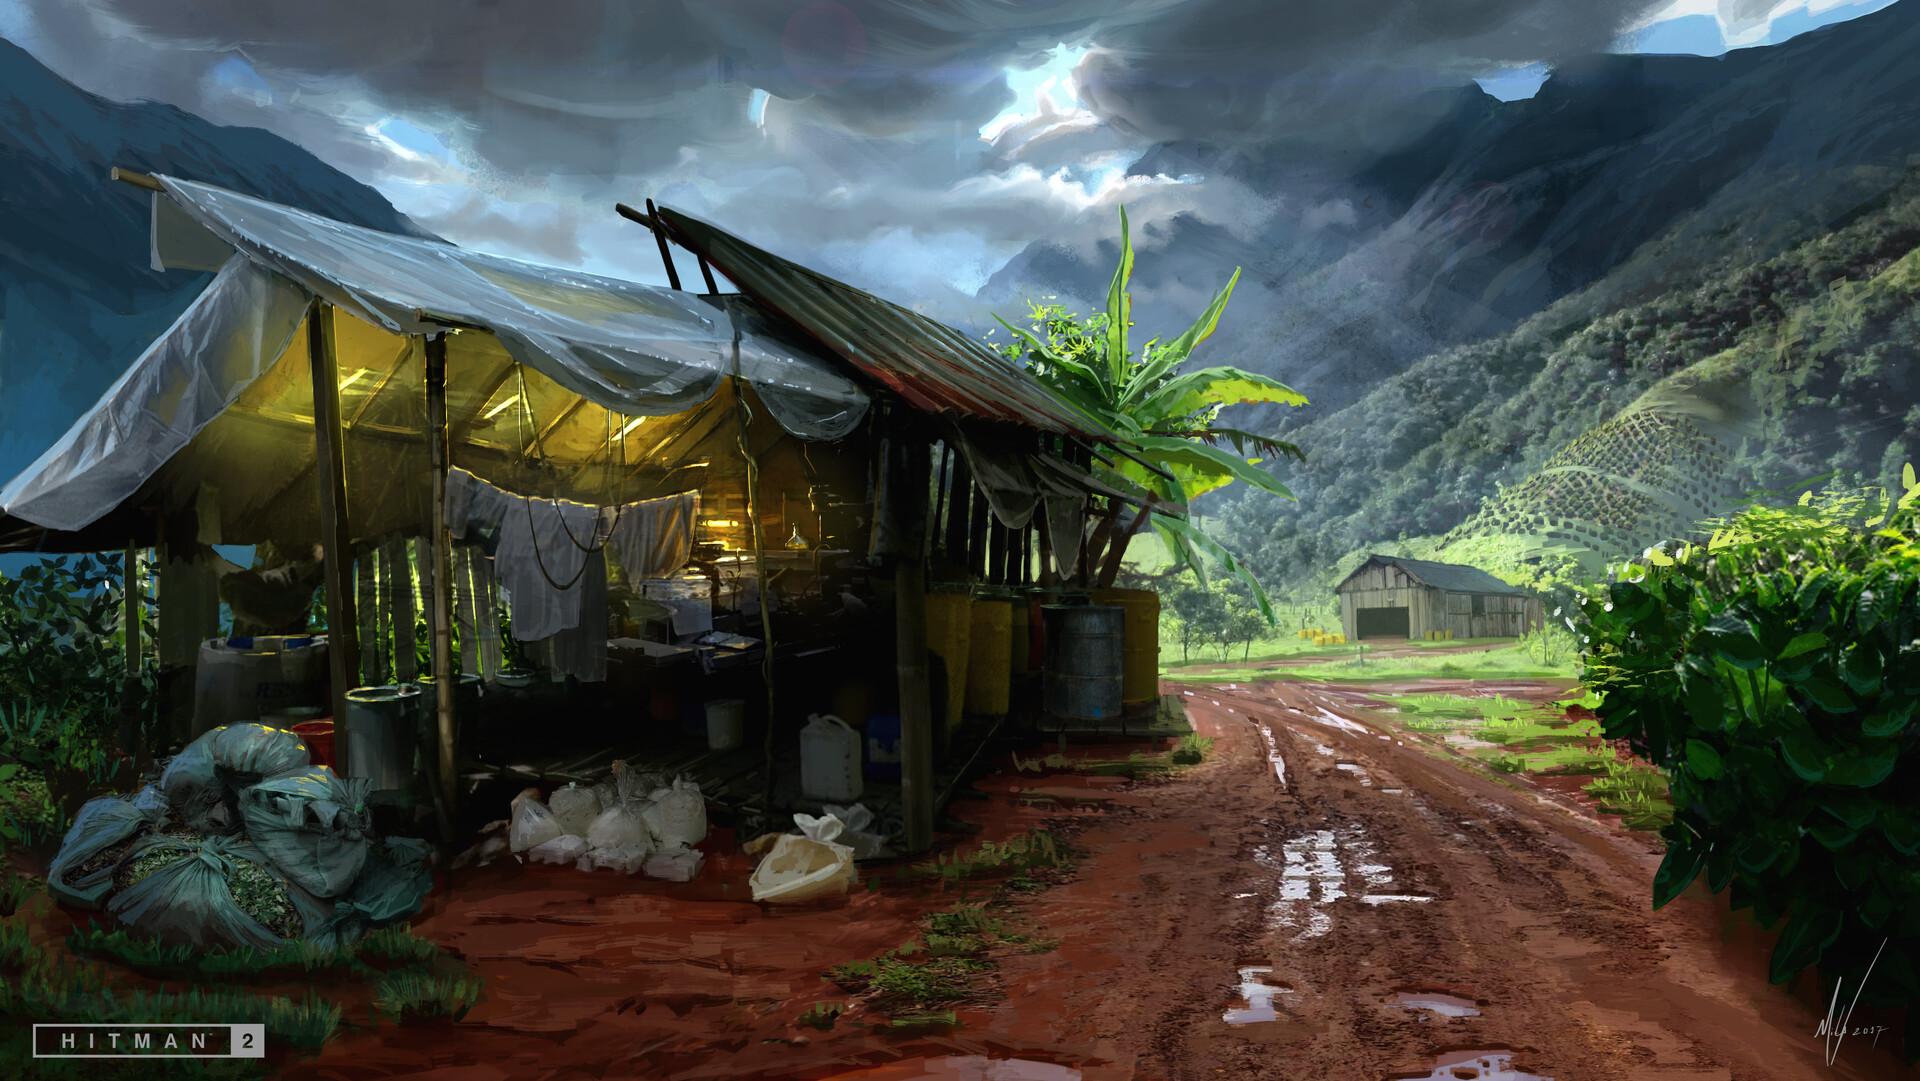 michal-kus-hitman-colombia-cocainefield-concept-01-c.jpg